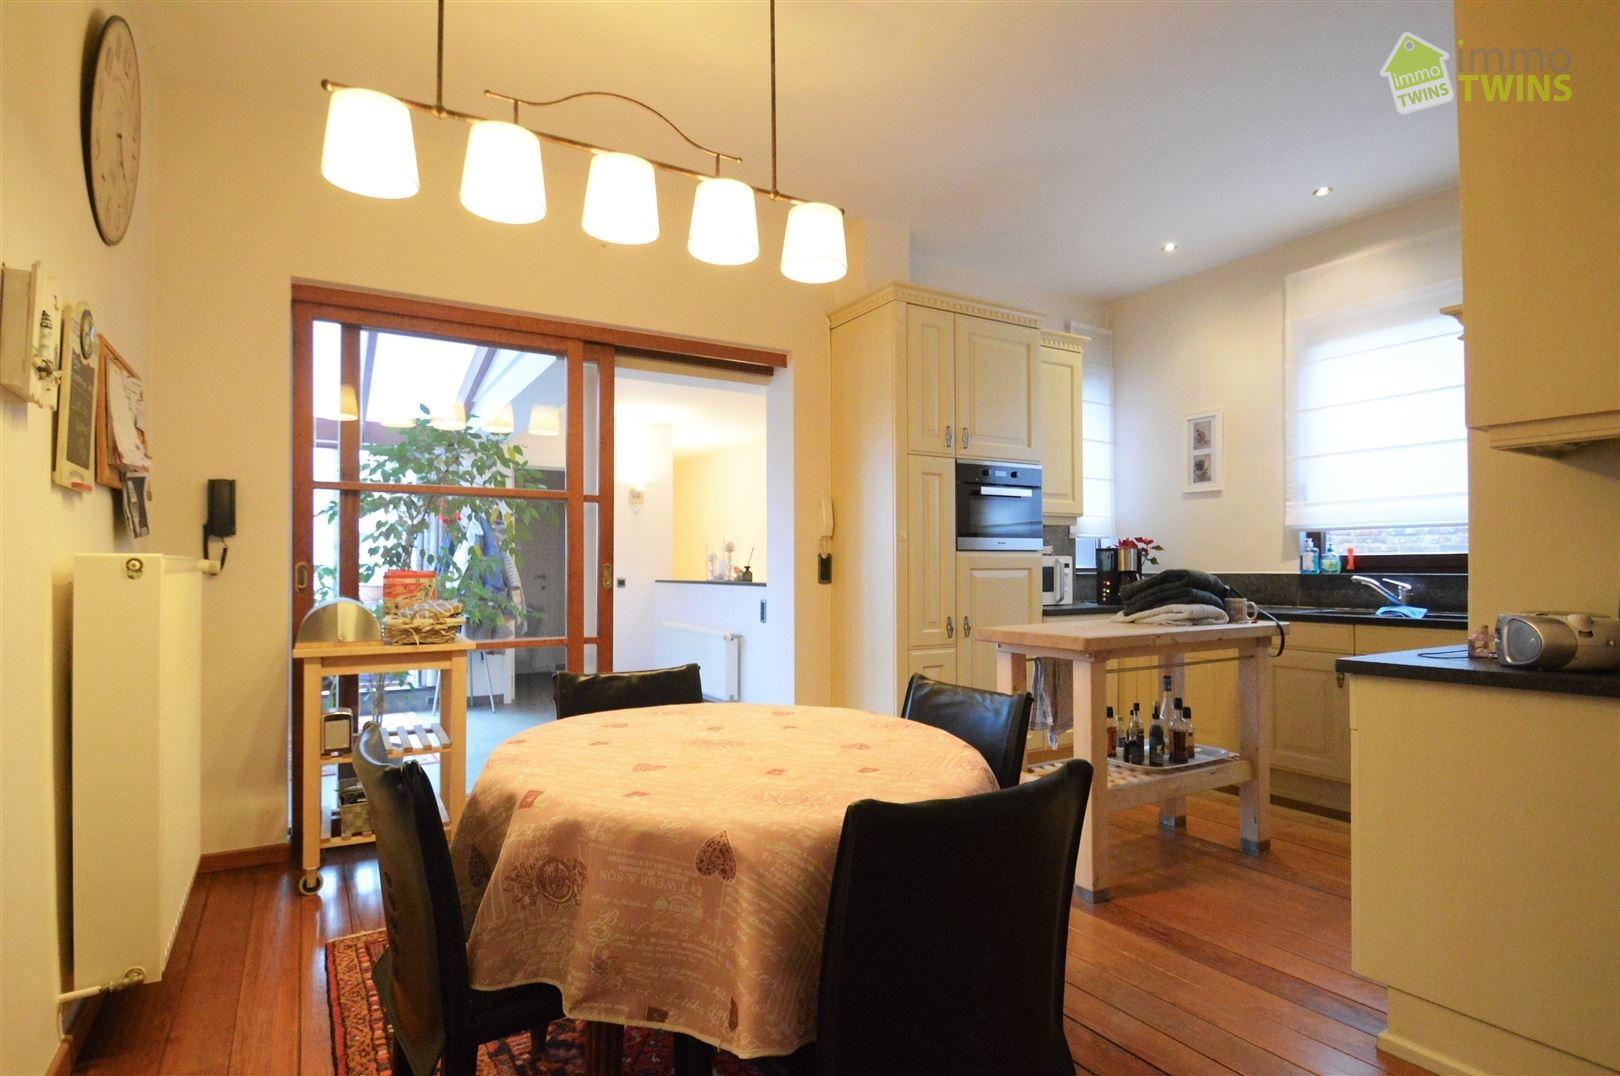 Foto 7 : Duplex/Penthouse te 2890 SINT-AMANDS (België) - Prijs € 449.000